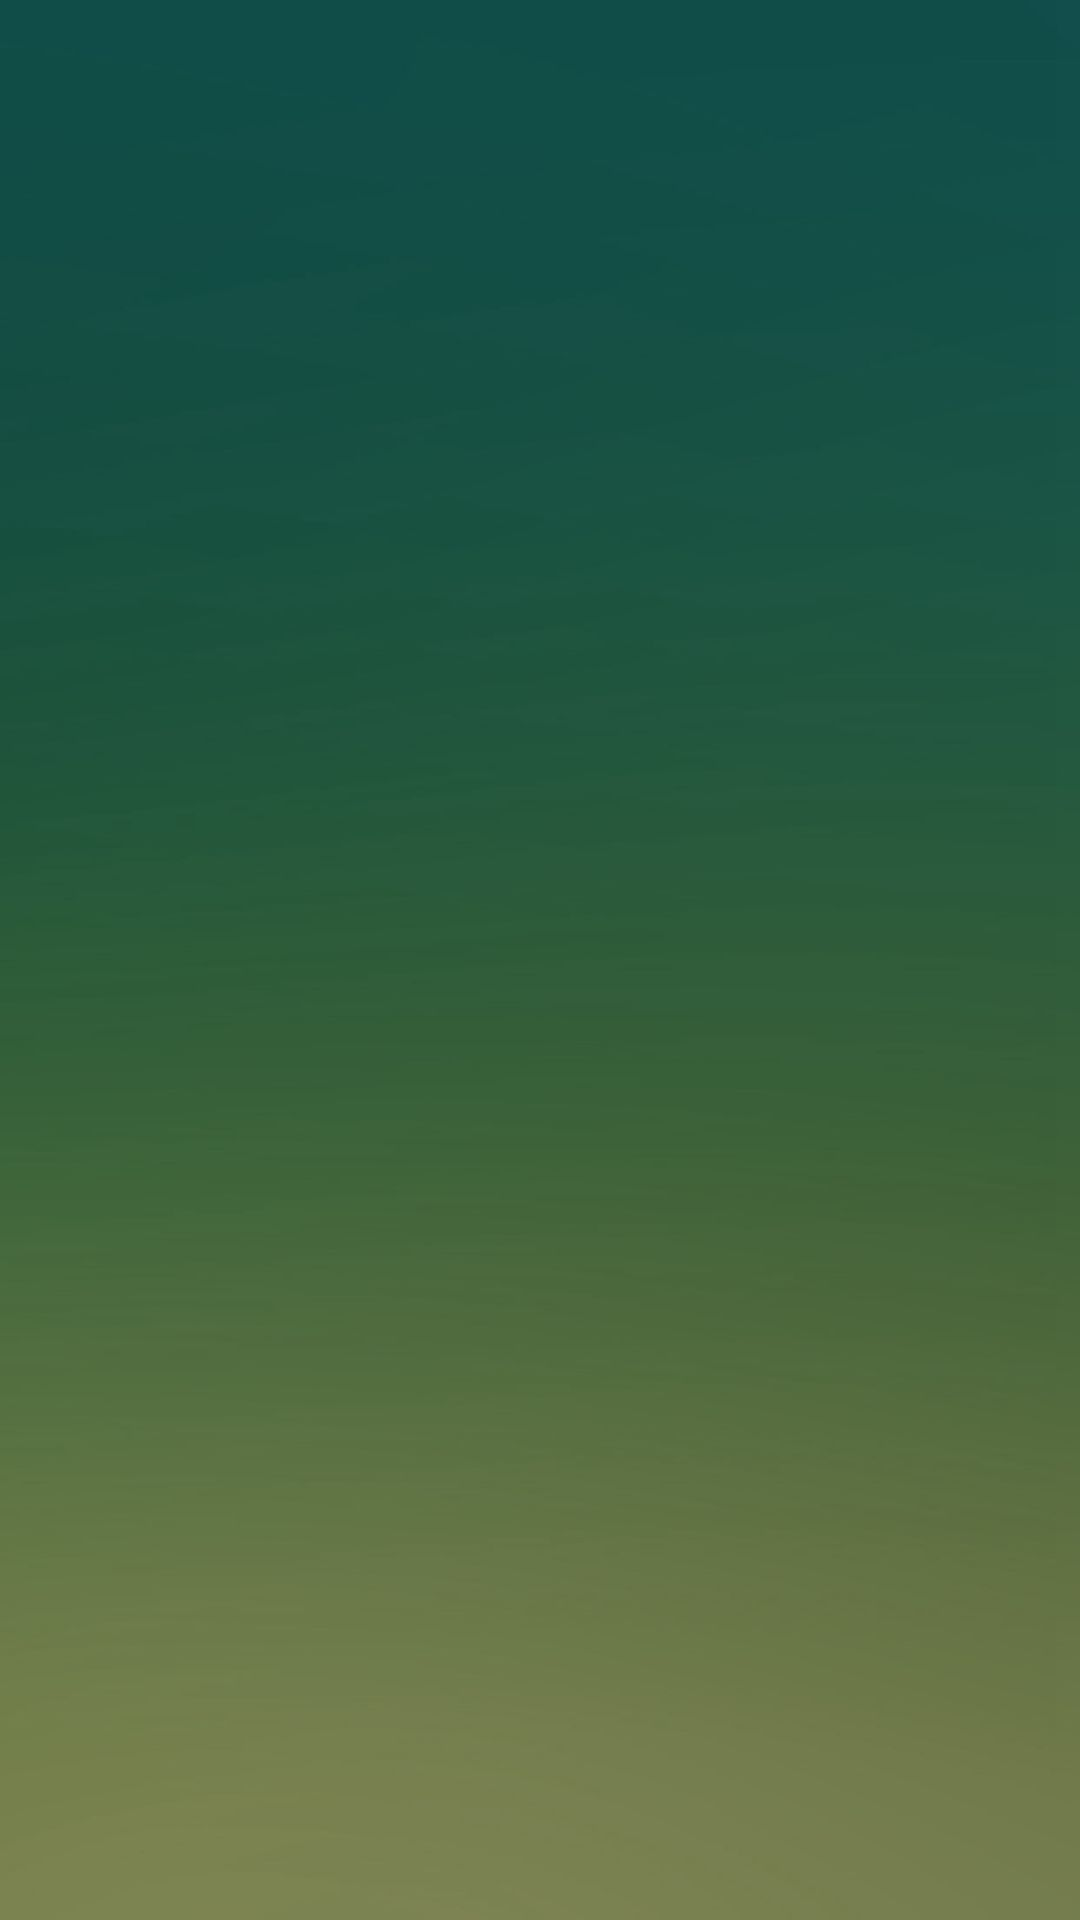 Green Yellow Summer Gradation Blur Iphone 6 Wallpaper Download Iphone Wallpapers Ipad Wallpapers One Stop Download Latar Belakang Warna Solid Warna Gambar